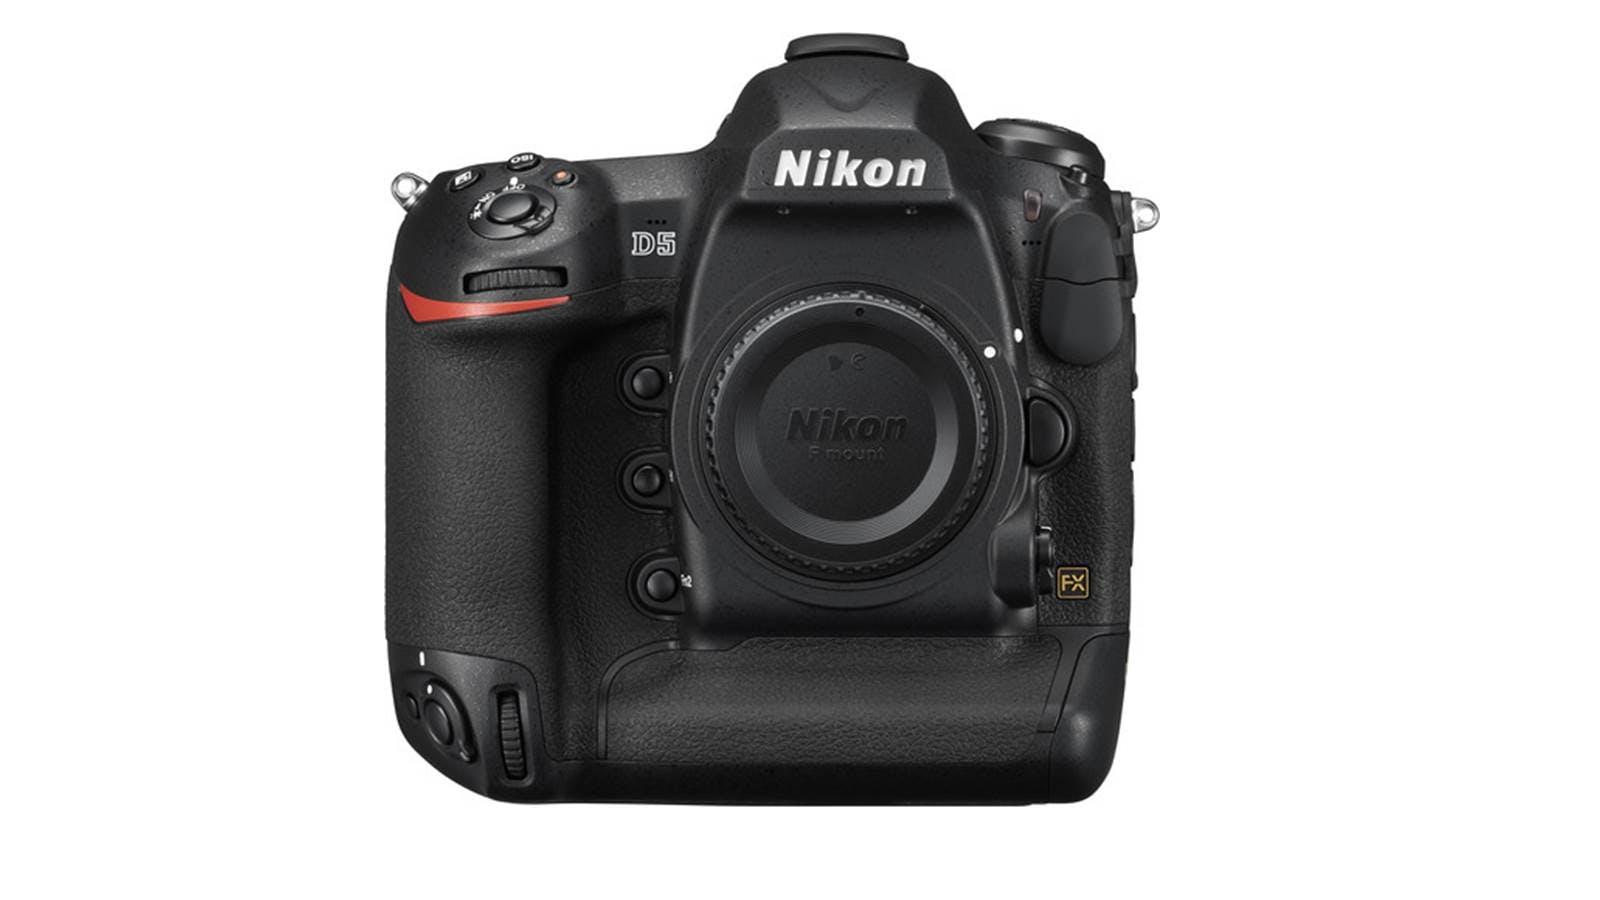 Camera Harvey Norman Dslr Cameras nikon d5 dslr camera body only dual cf slots harvey norman slots